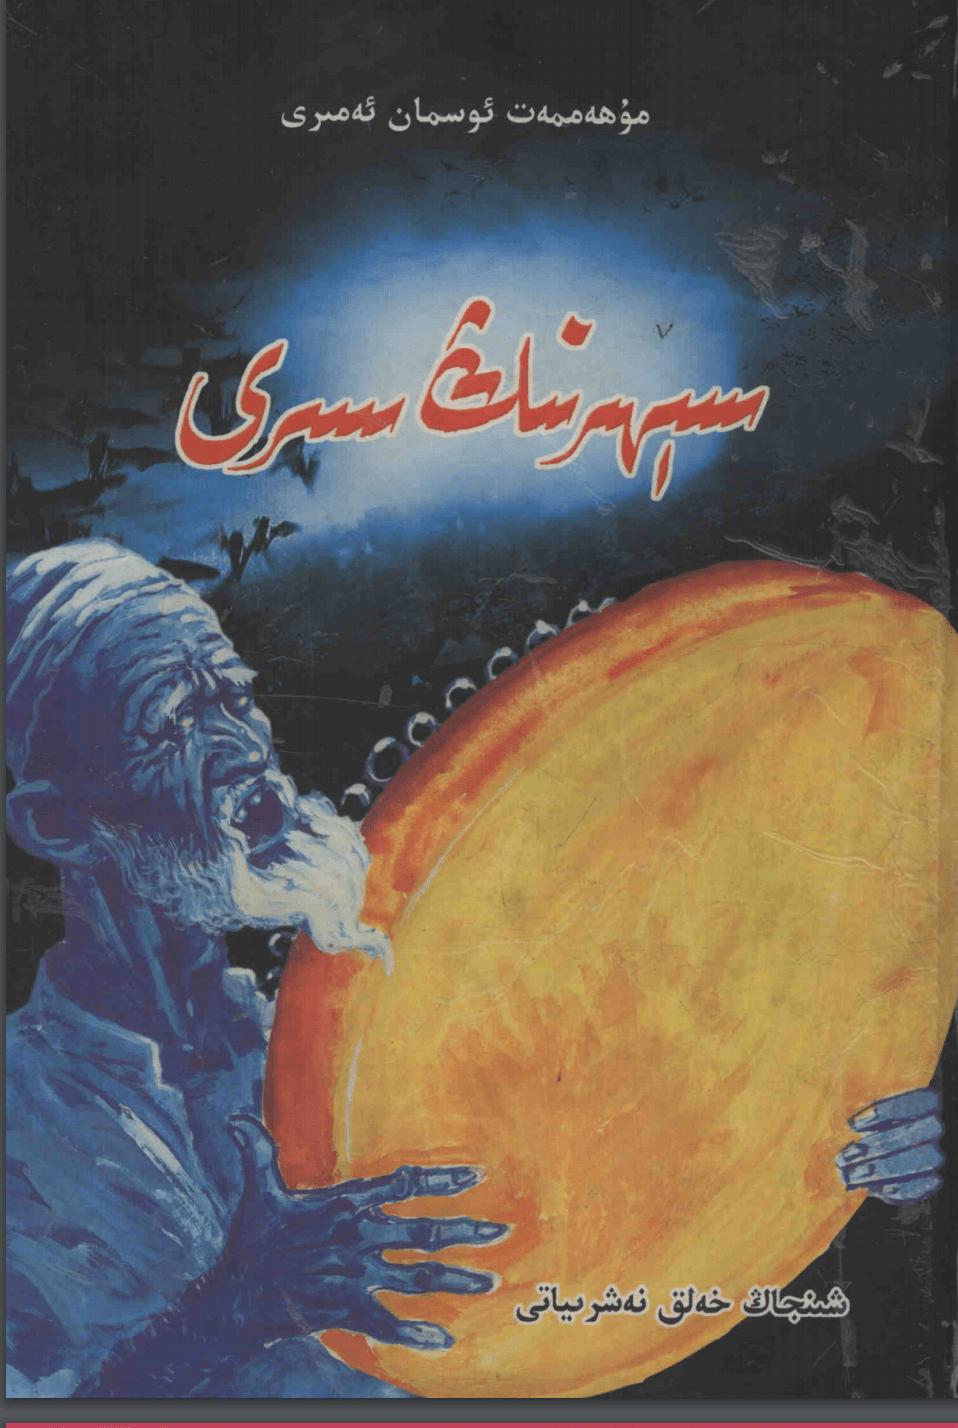 3009 19 pdf - سېھىرنىڭ سىرى (Muhemmet ئوسمان ئەمىرى)